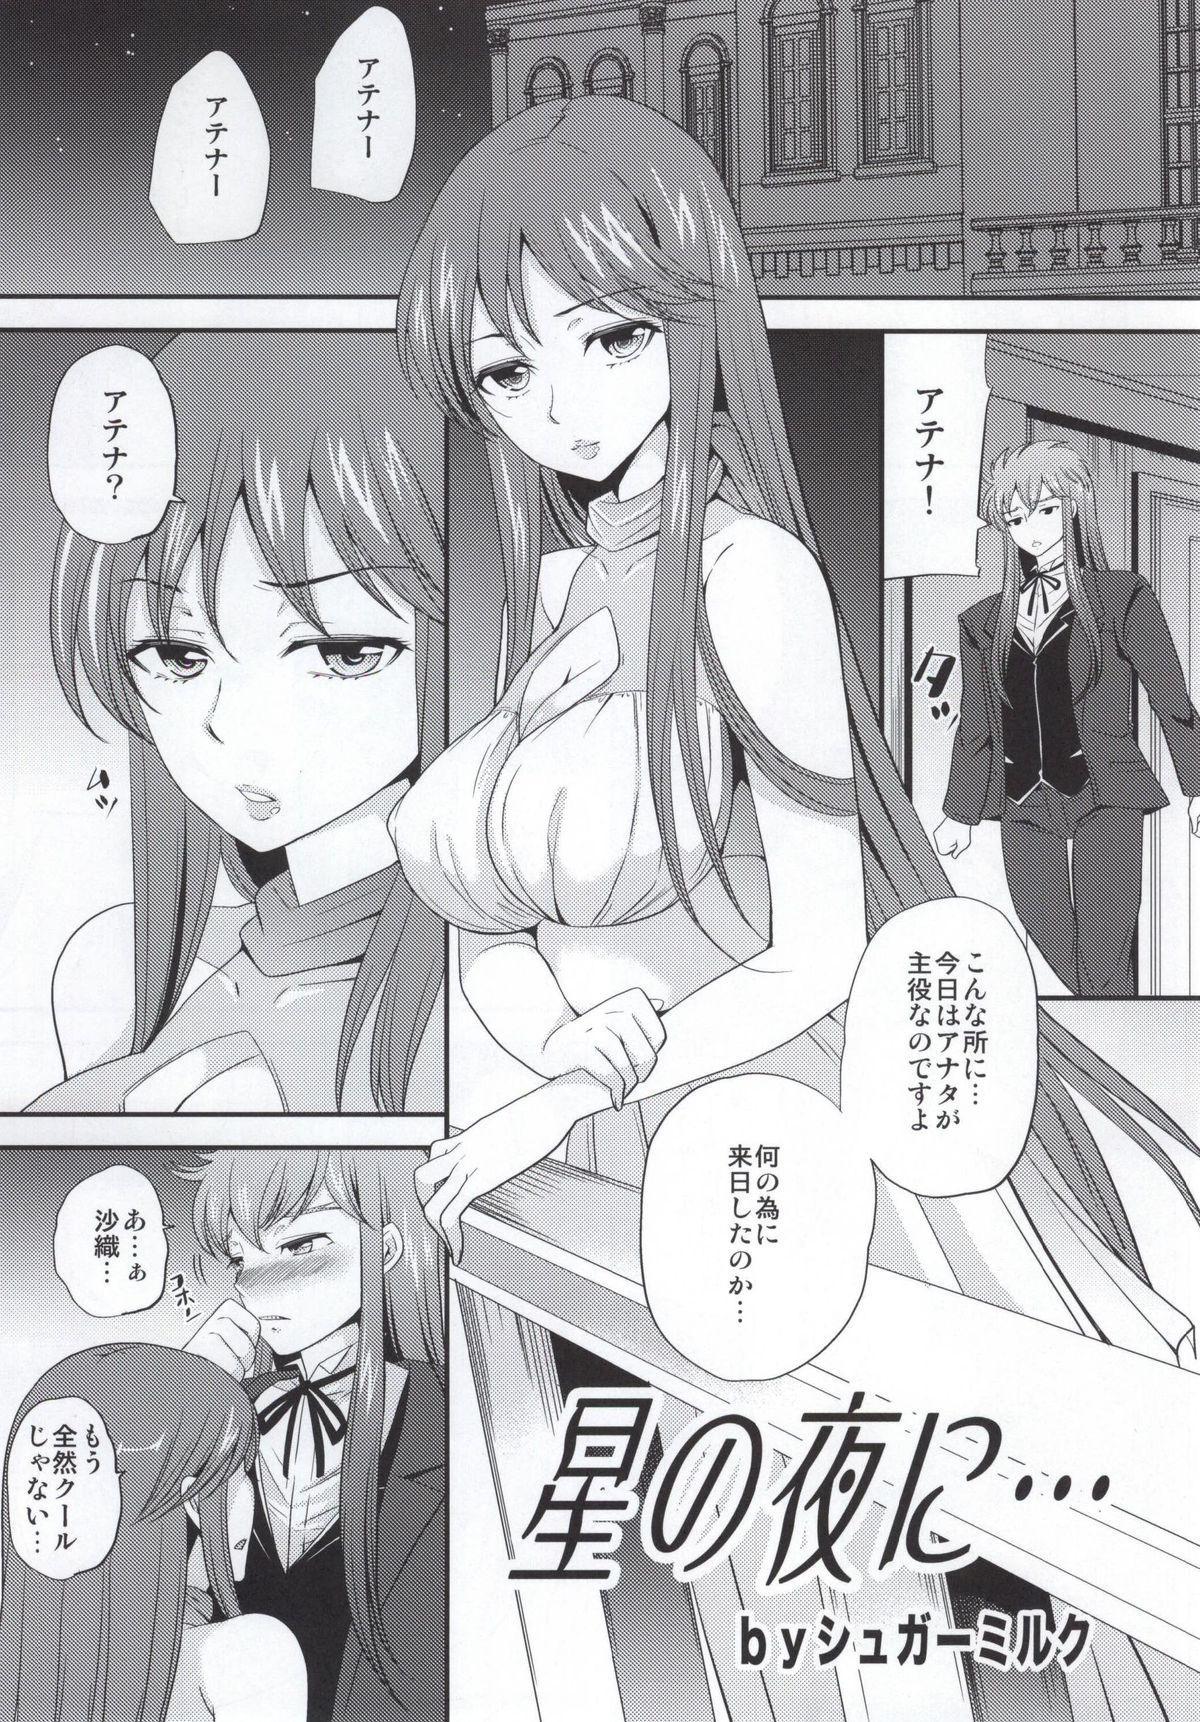 Kago no Naka no Megami 20